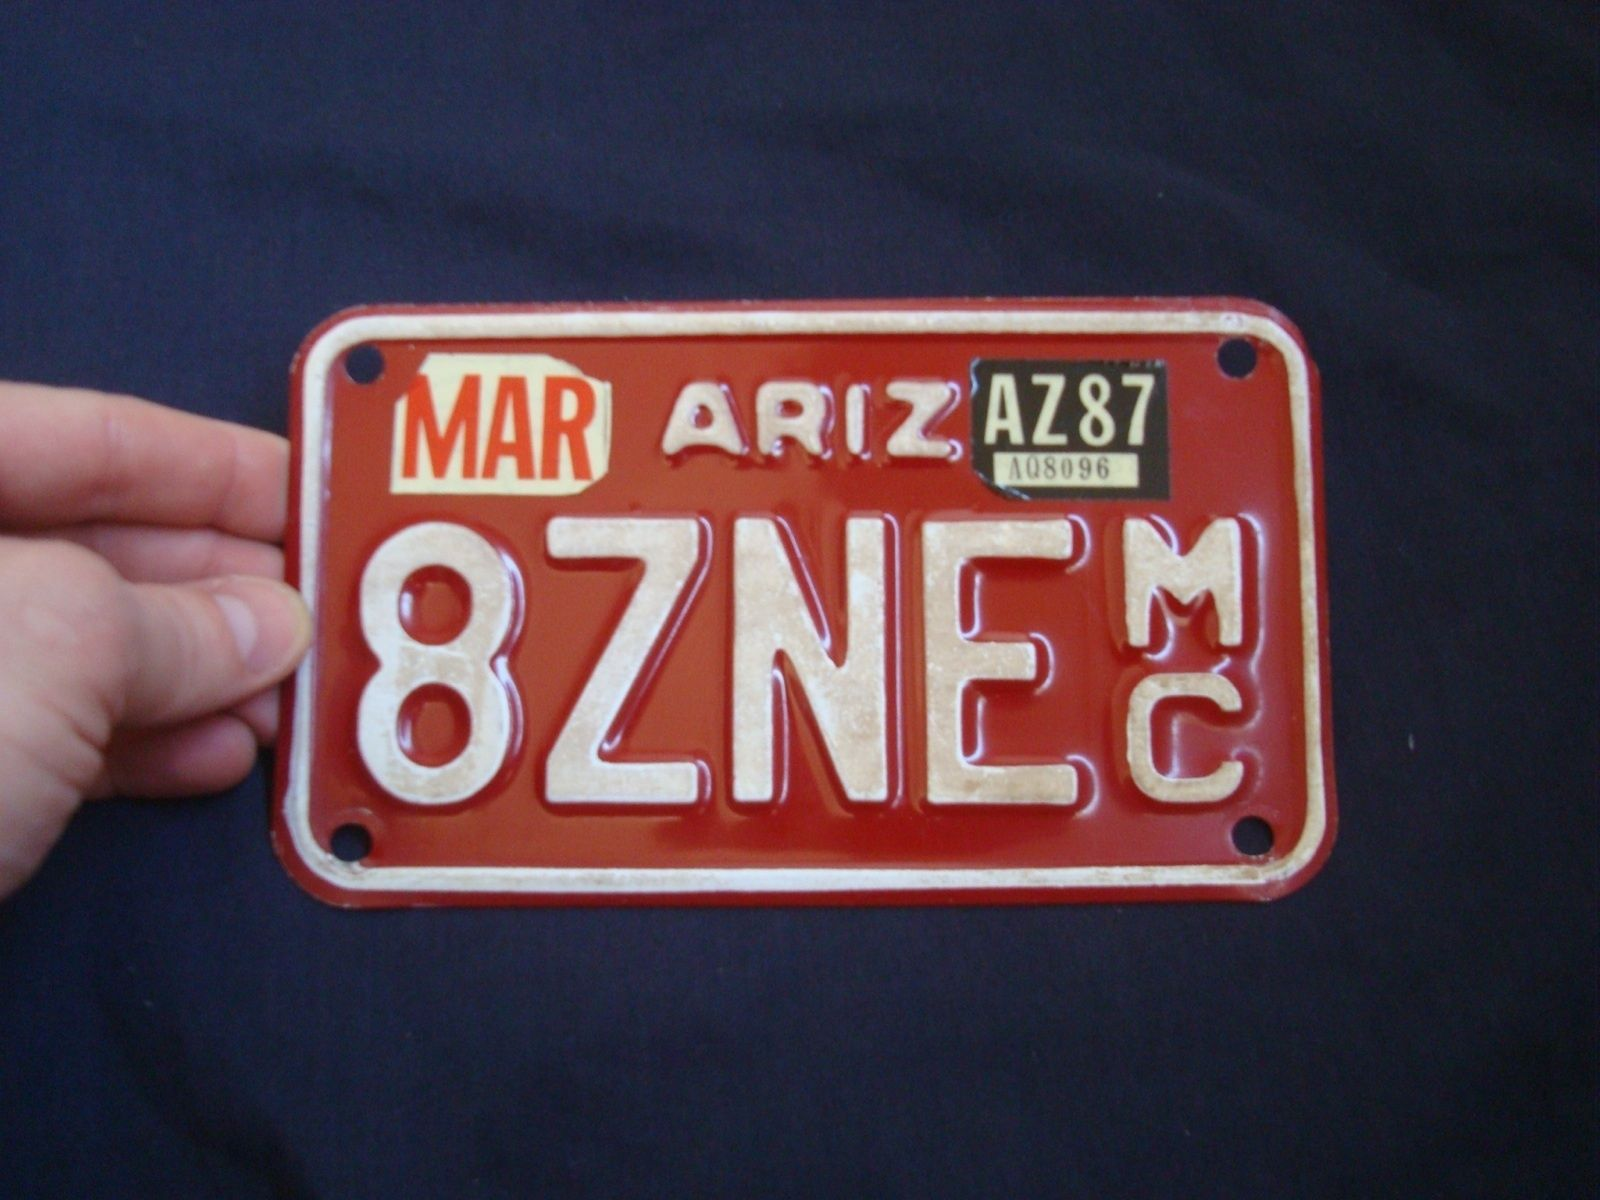 1987 arizona motorcycle 8zne vintage motorcycle license